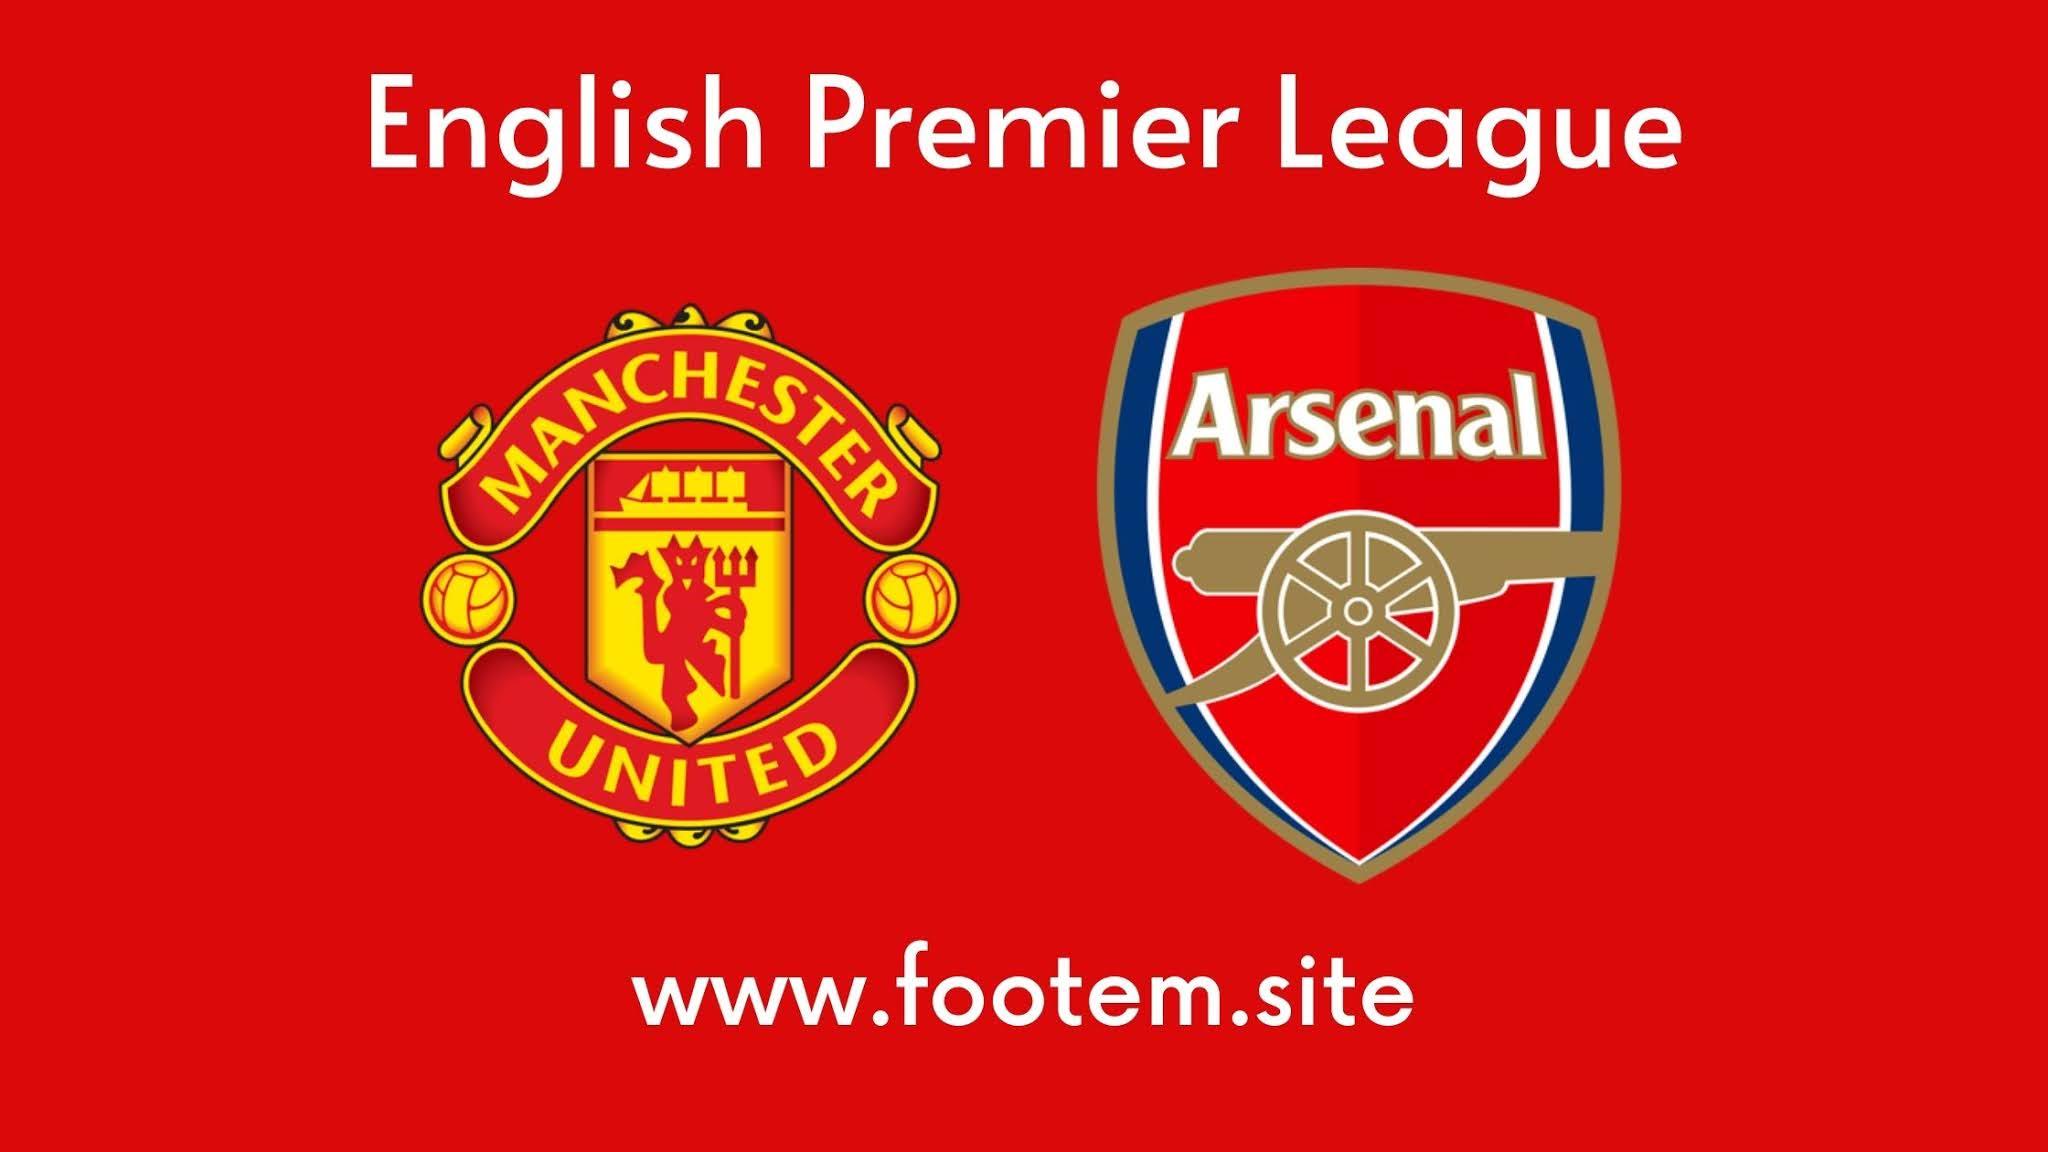 Arsenal vs Manchester United live footem7 footem.site